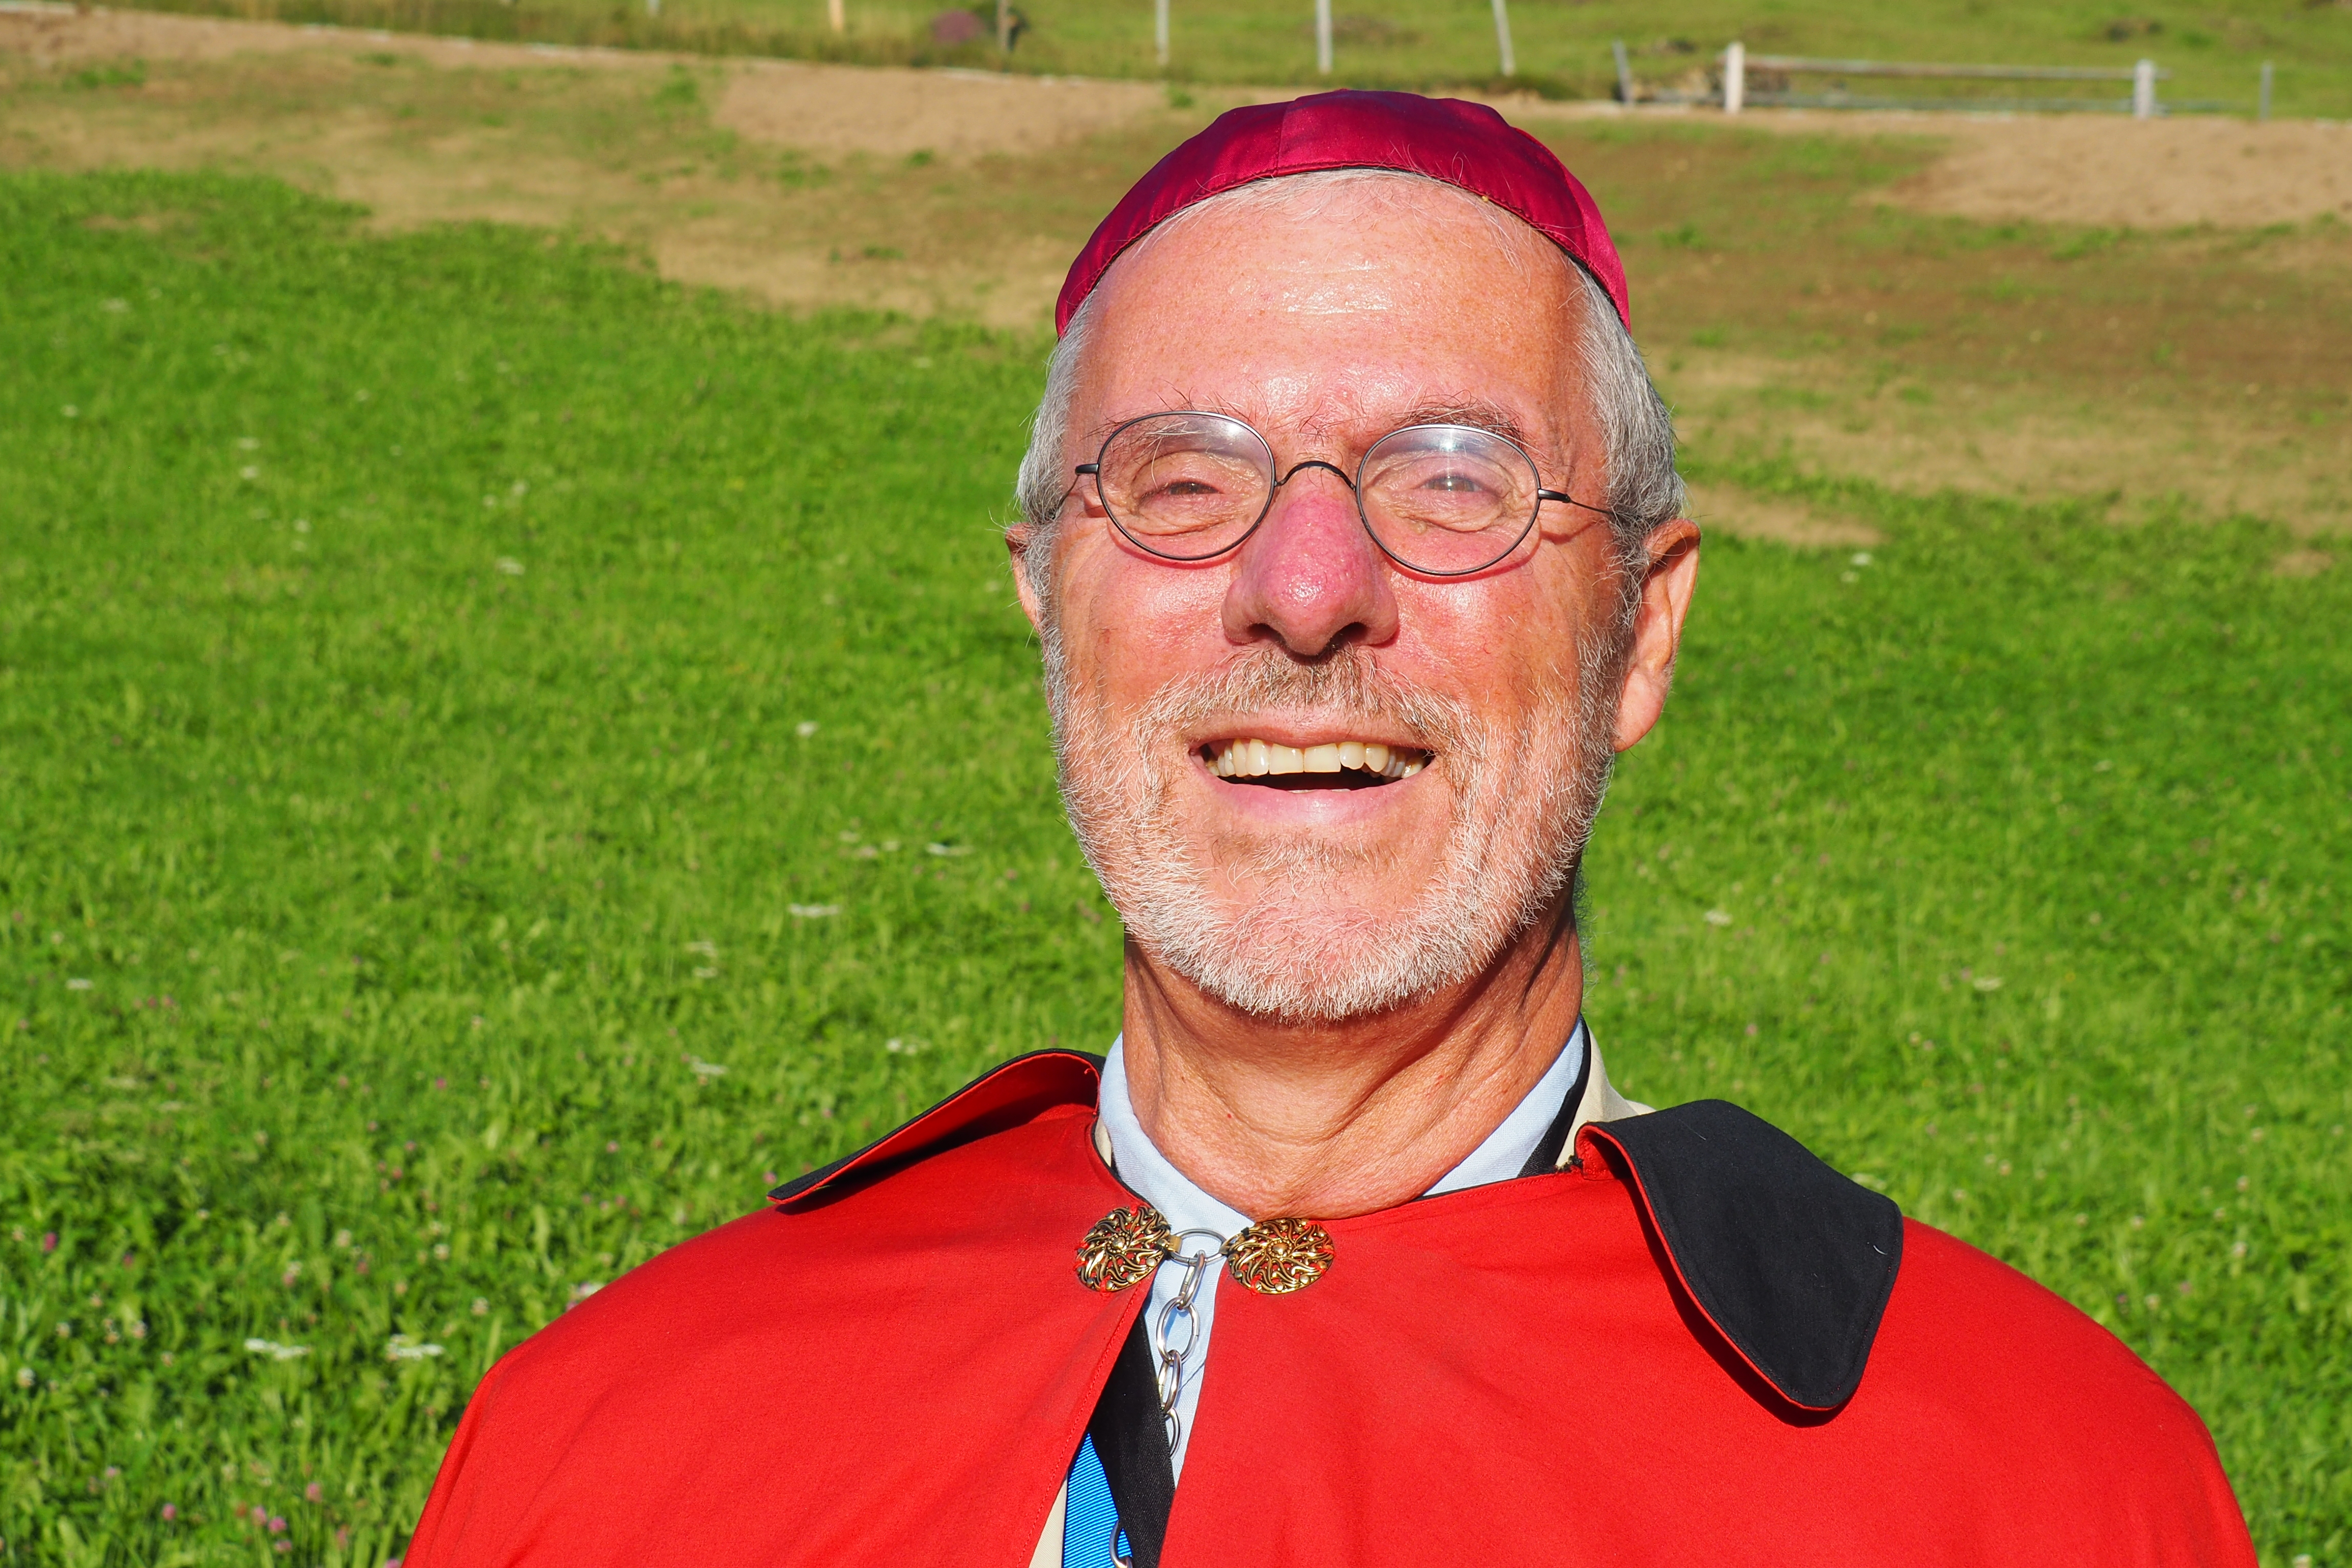 Christian Schweizer